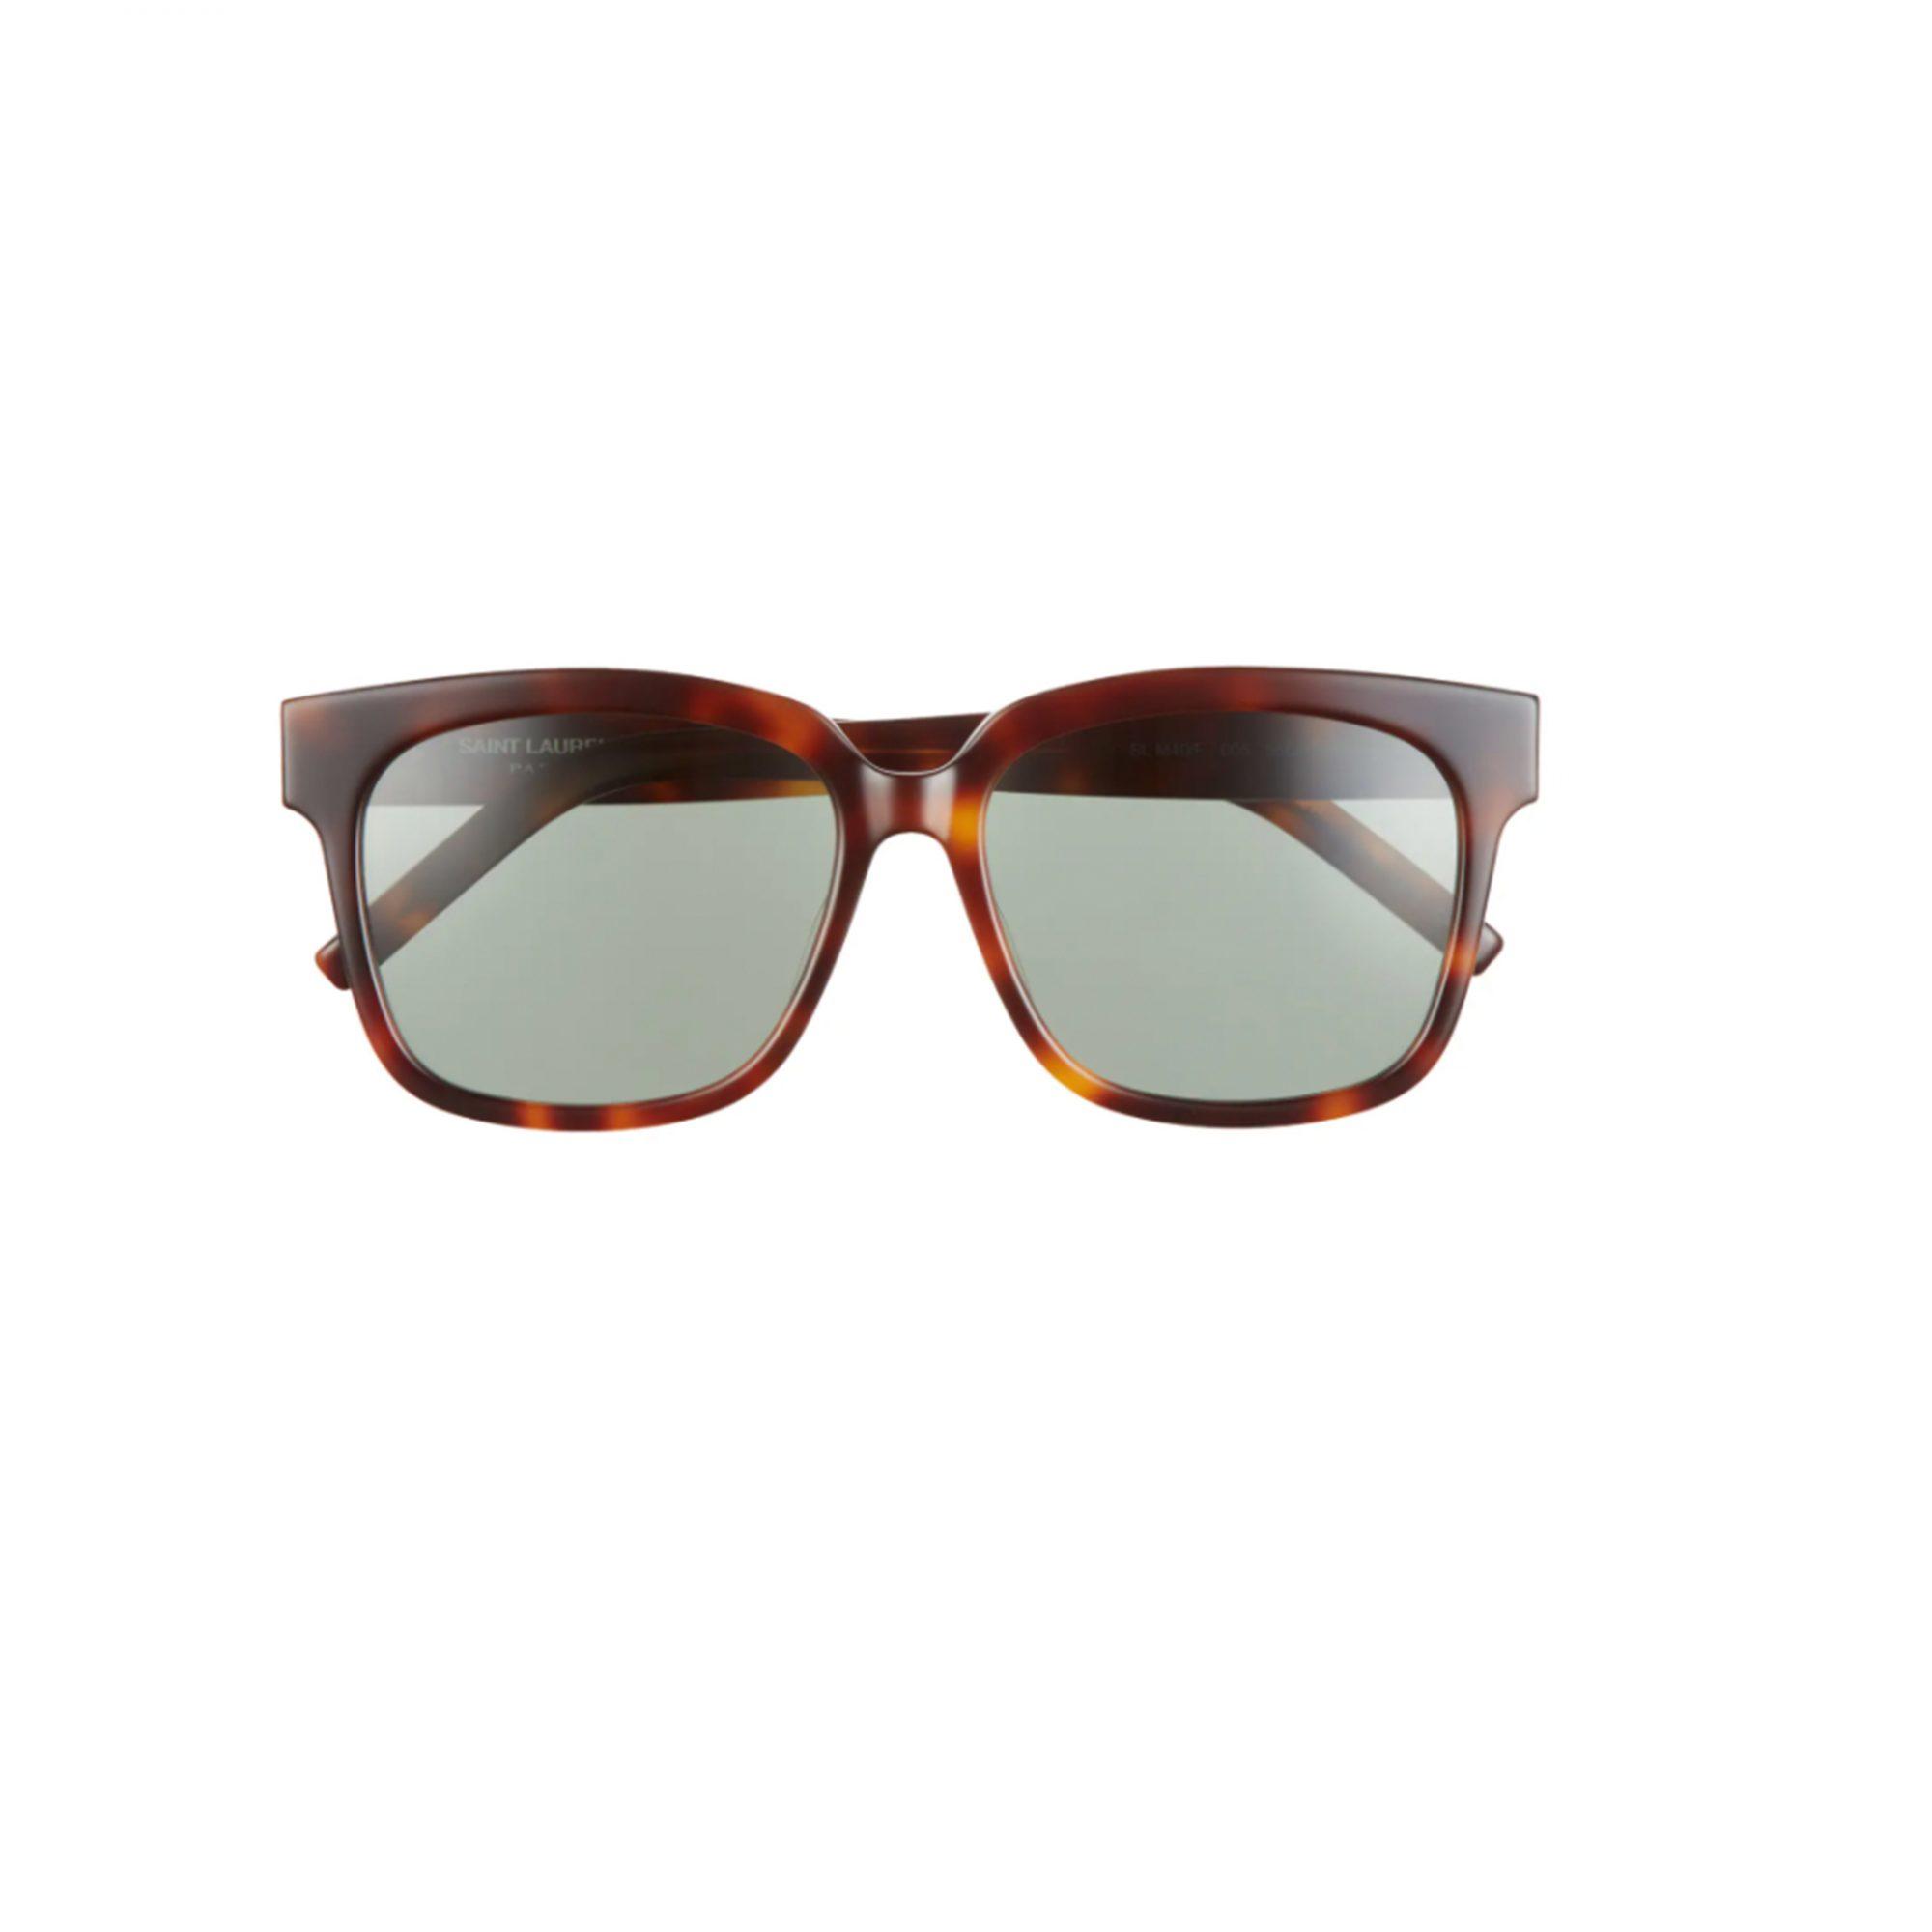 saint-laurent-sunglasses